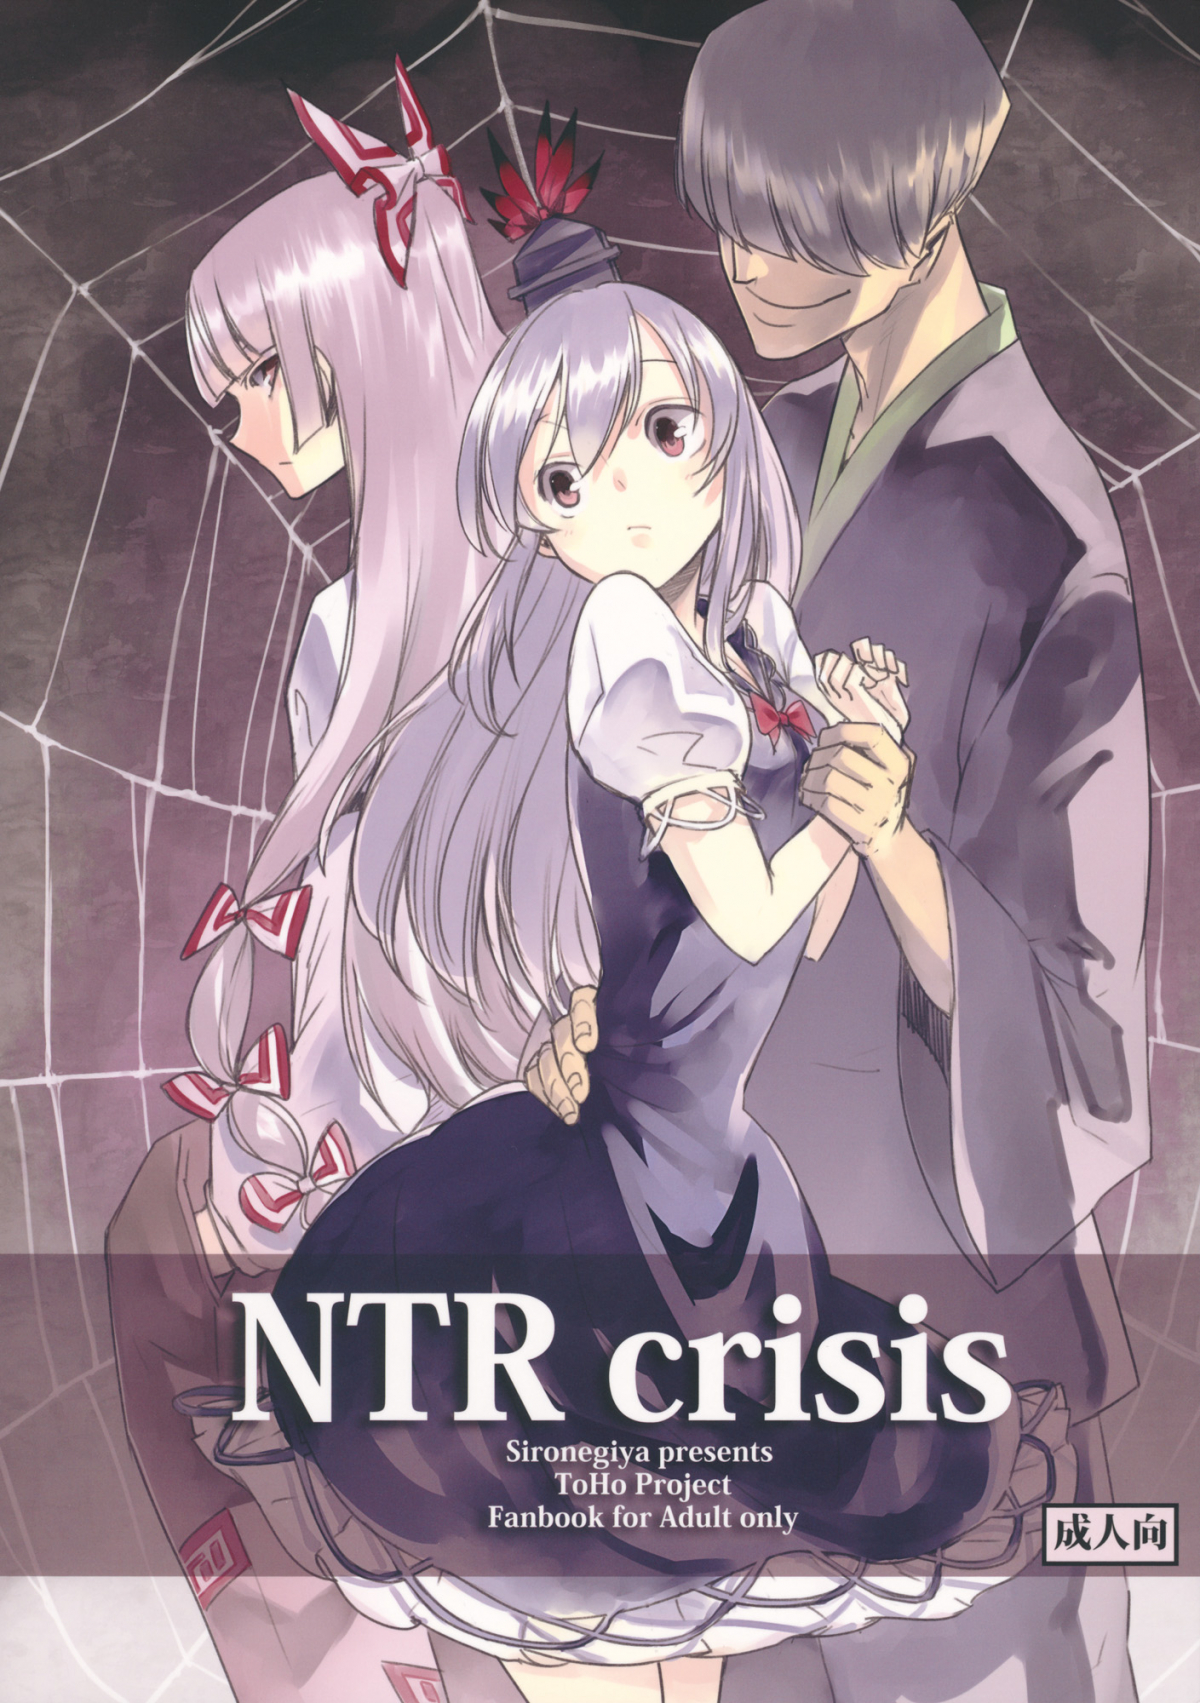 HentaiVN.net - Ảnh 1 - NTR crisis - Oneshot